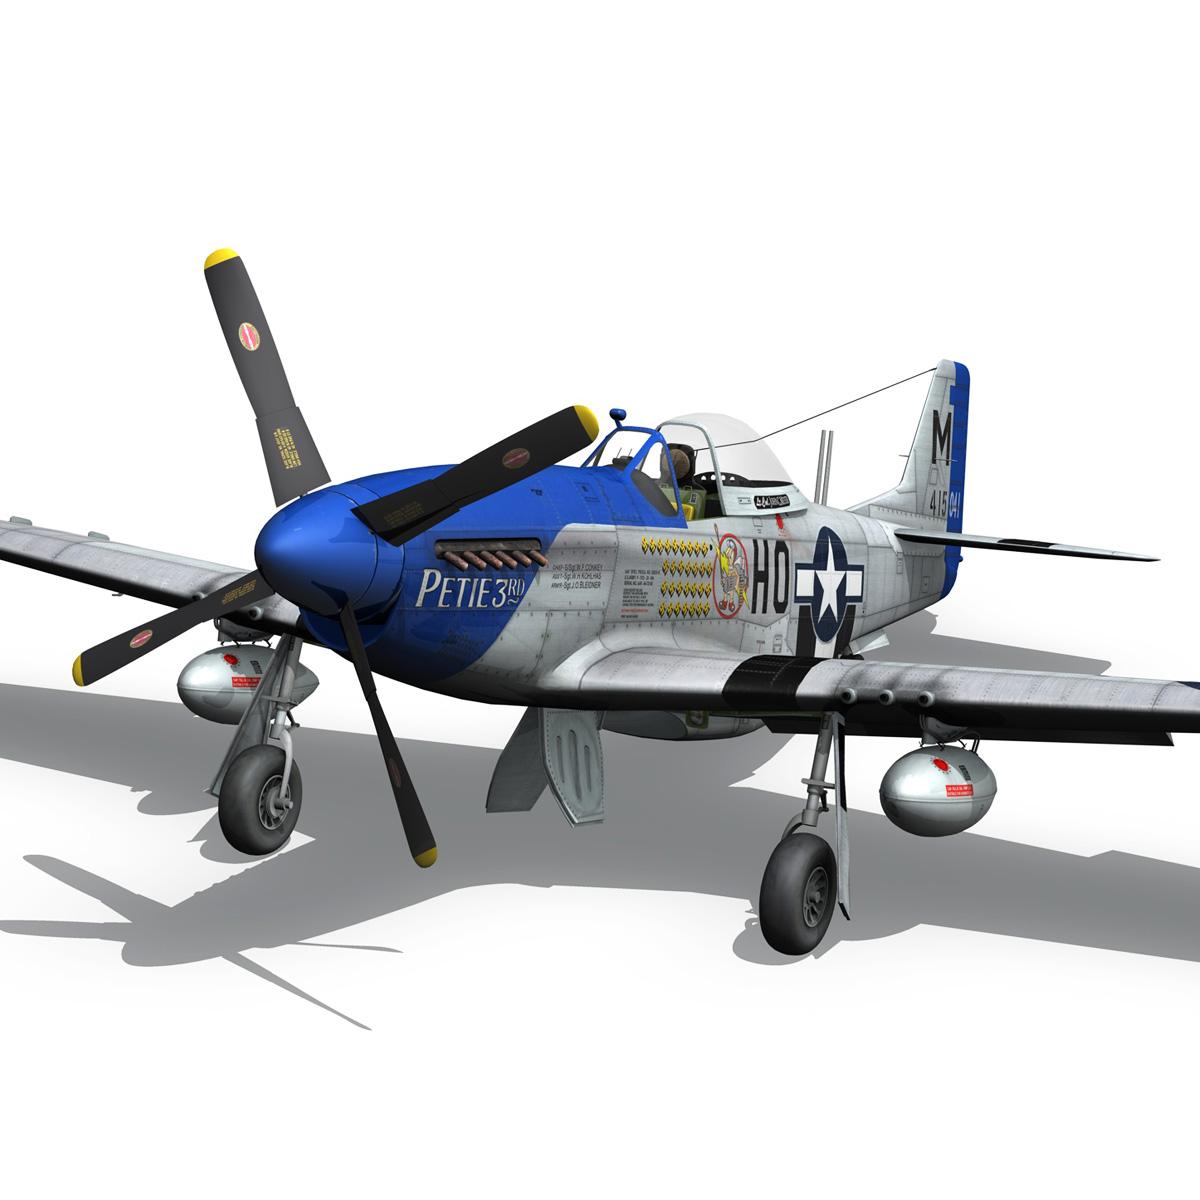 north american p-51d mustang – petie 3rd 3d model fbx c4d lwo obj 280135